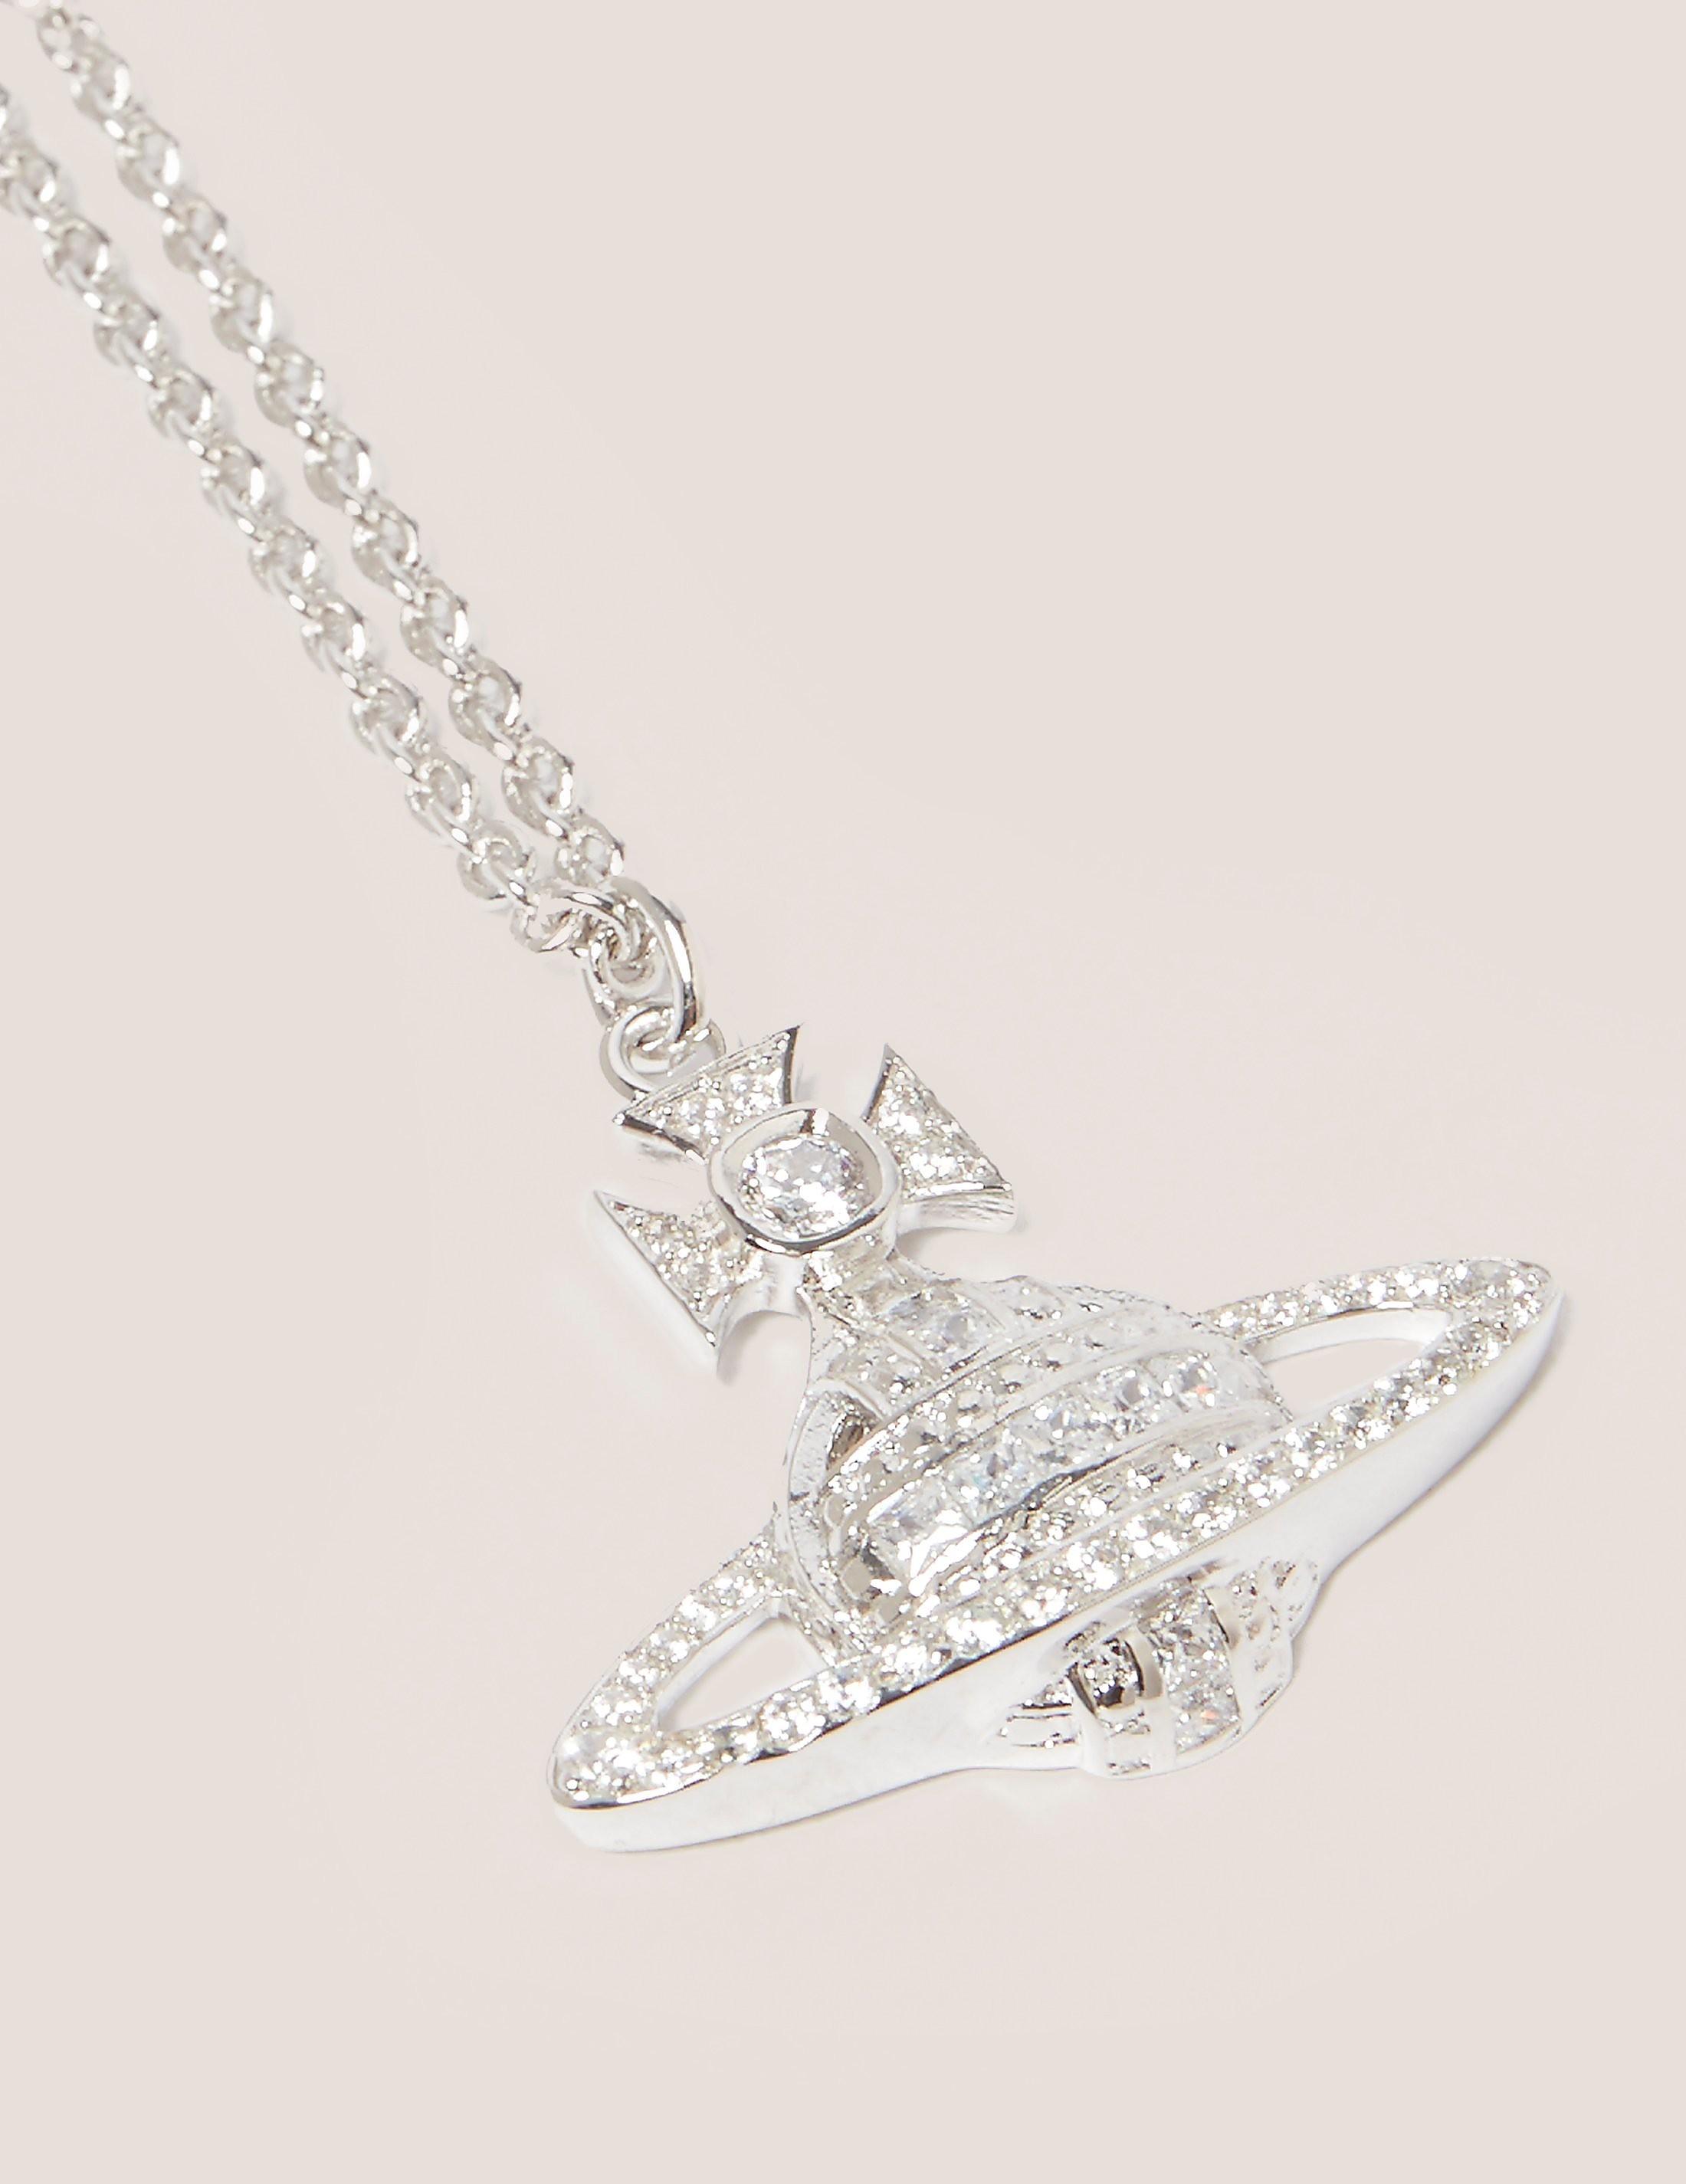 Vivienne Westwood Andrea Orb Necklace